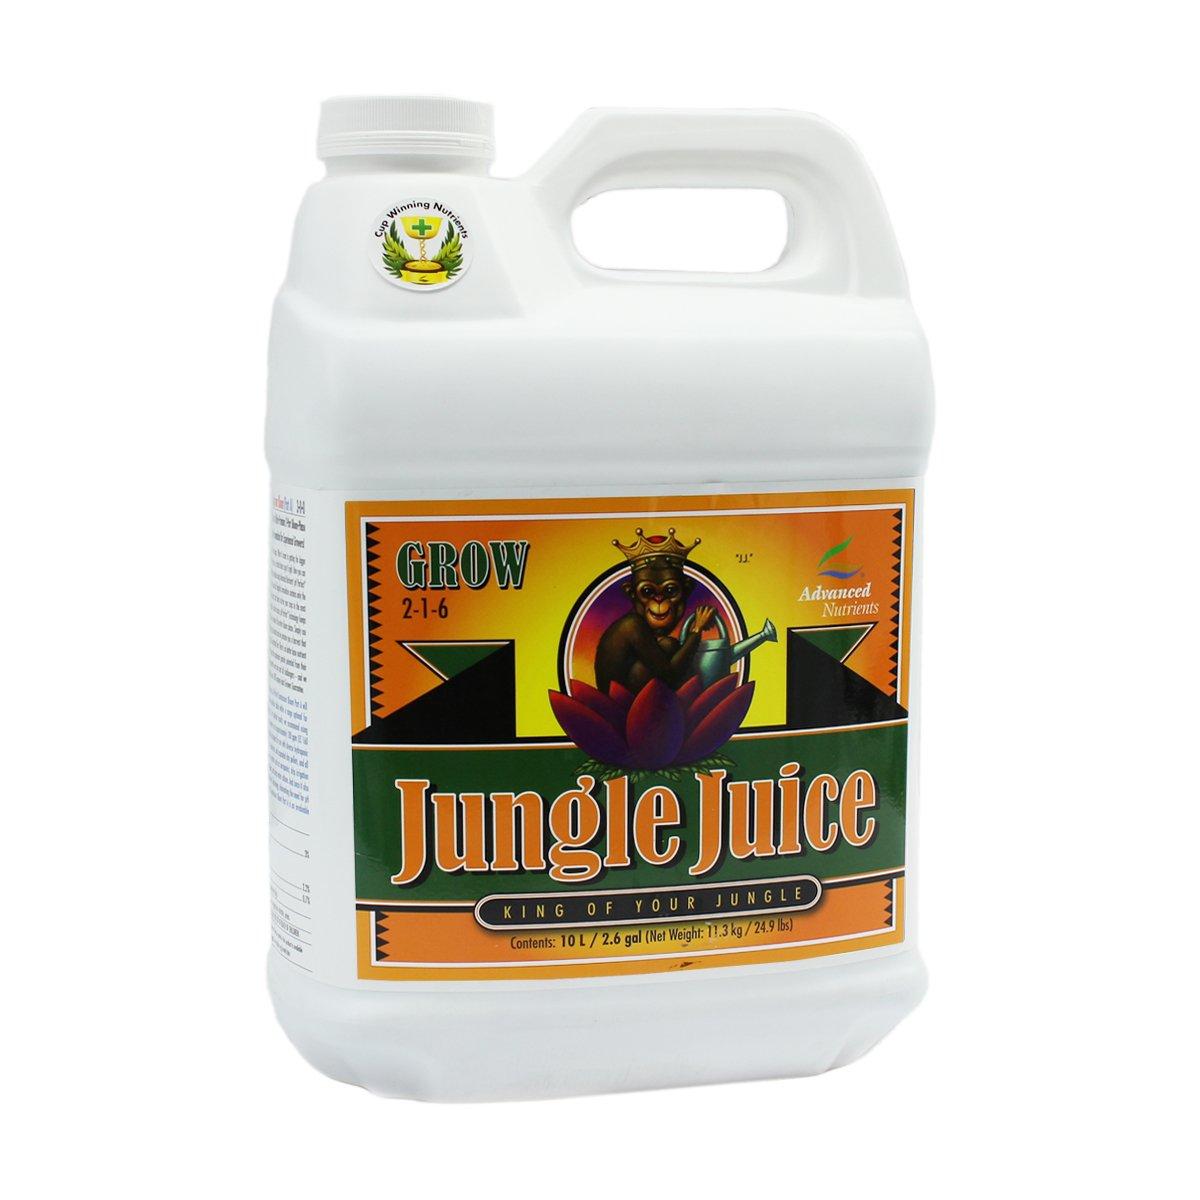 Advanced Nutrients 1725-16 Jungle Juice Grow Fertilizer, 10 Liter, Brown/A